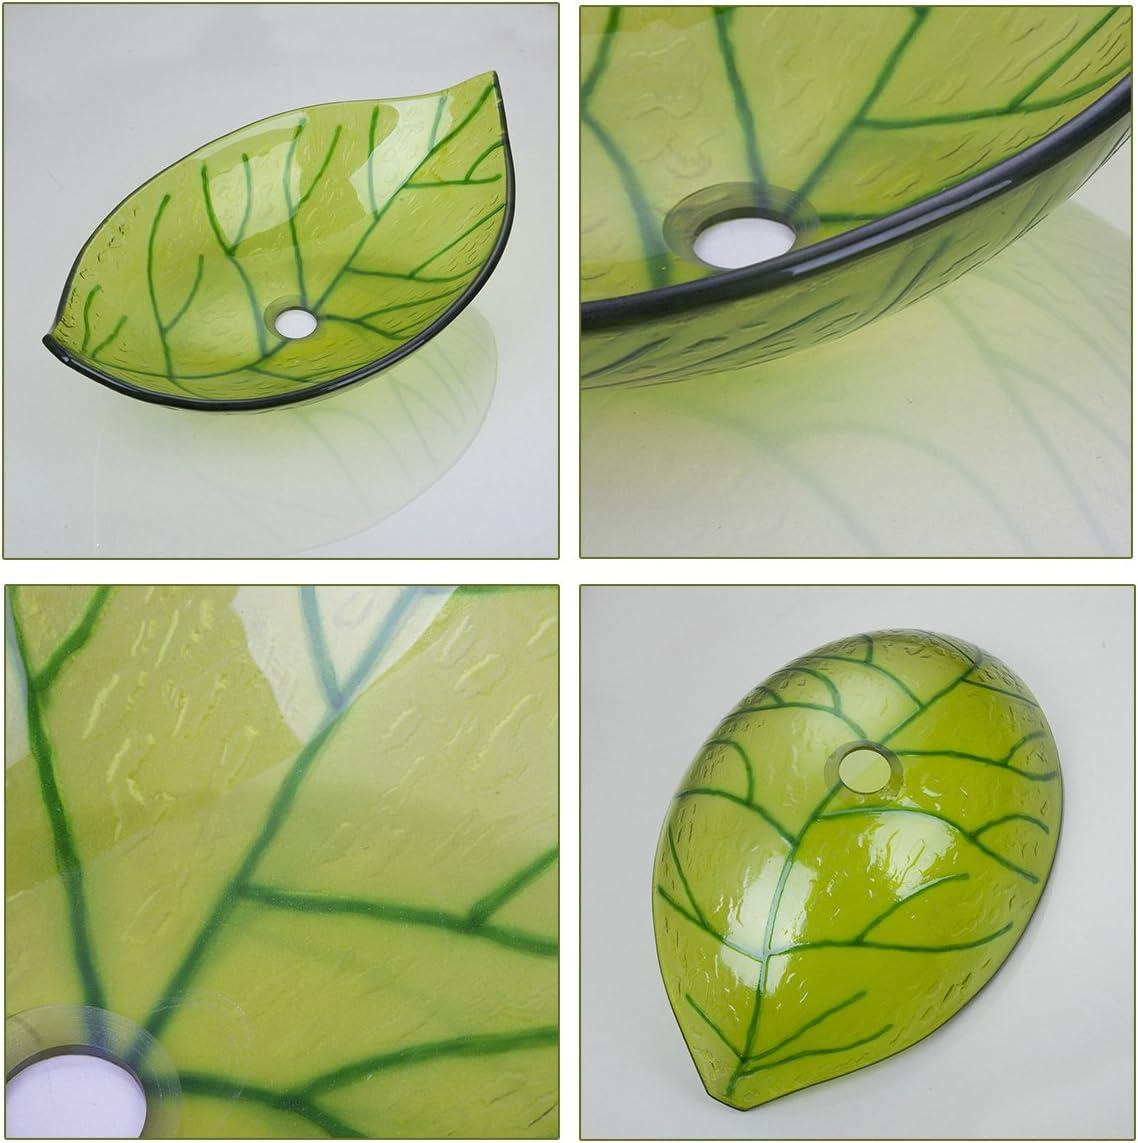 Yanksmark Silver Color Glass Wash Bowl Vessel Sink /& Chrome Bathroom Faucet Finish Combo Set Come with Pop Up Drain